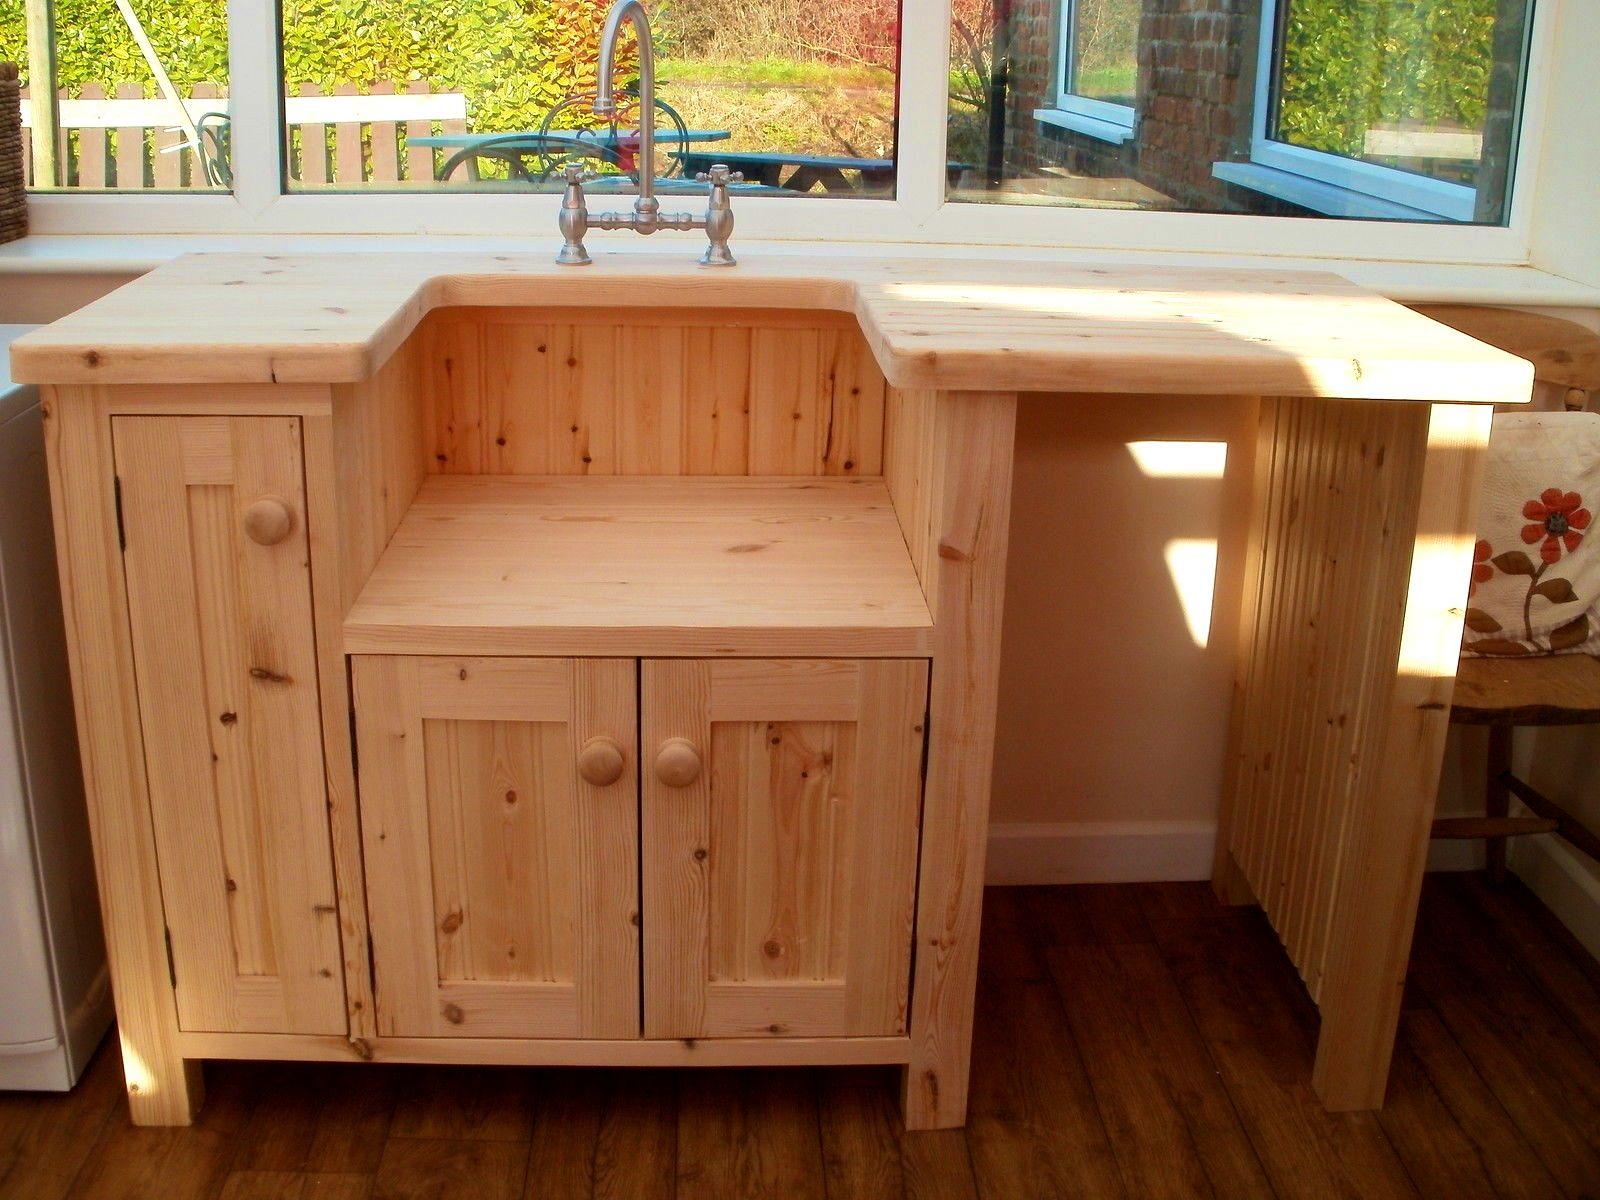 Bathroom Splendid Standing Kitchen Sink Unit Image Free Basin